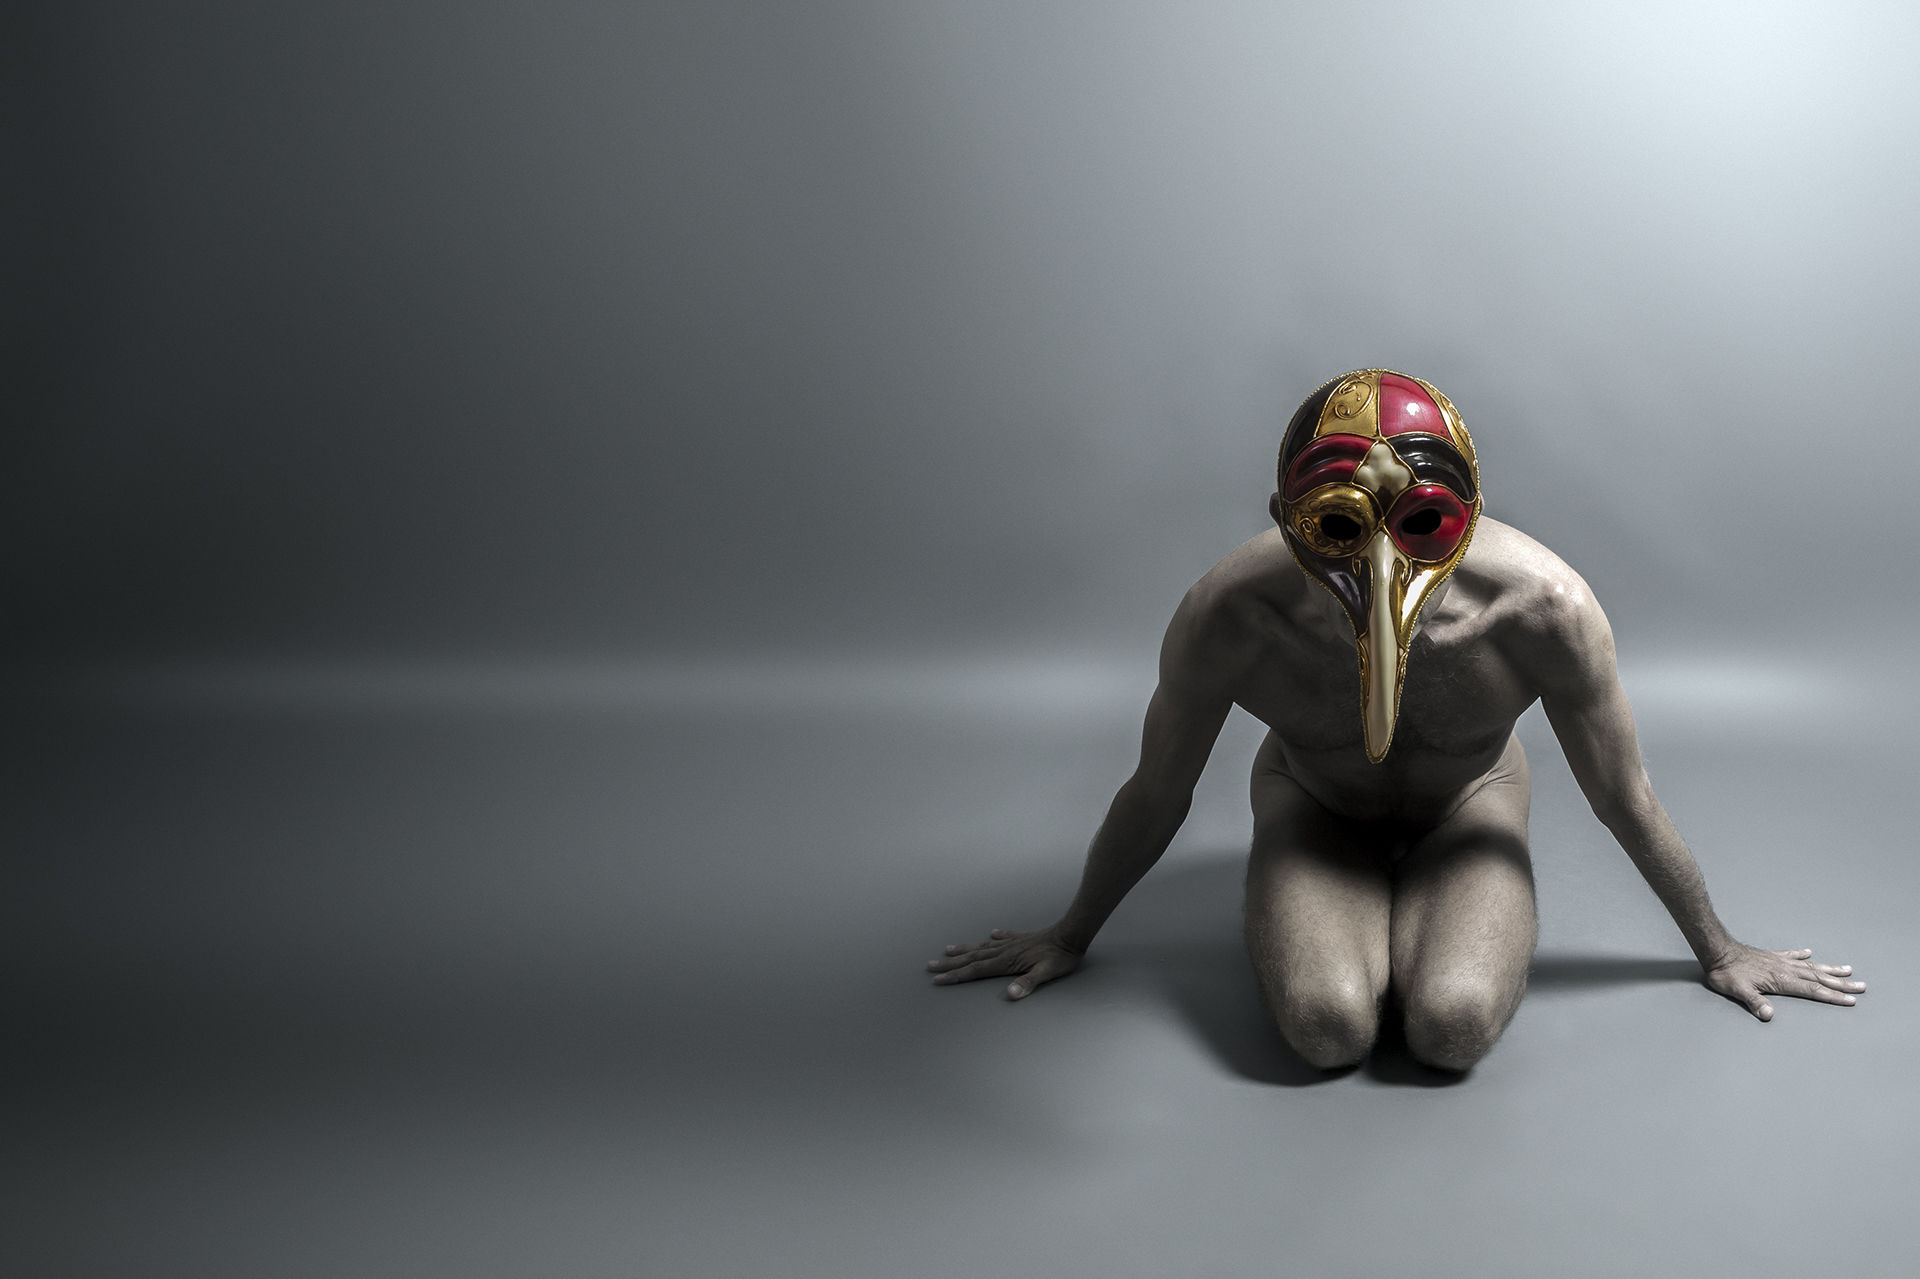 Masked Heroes: Survival